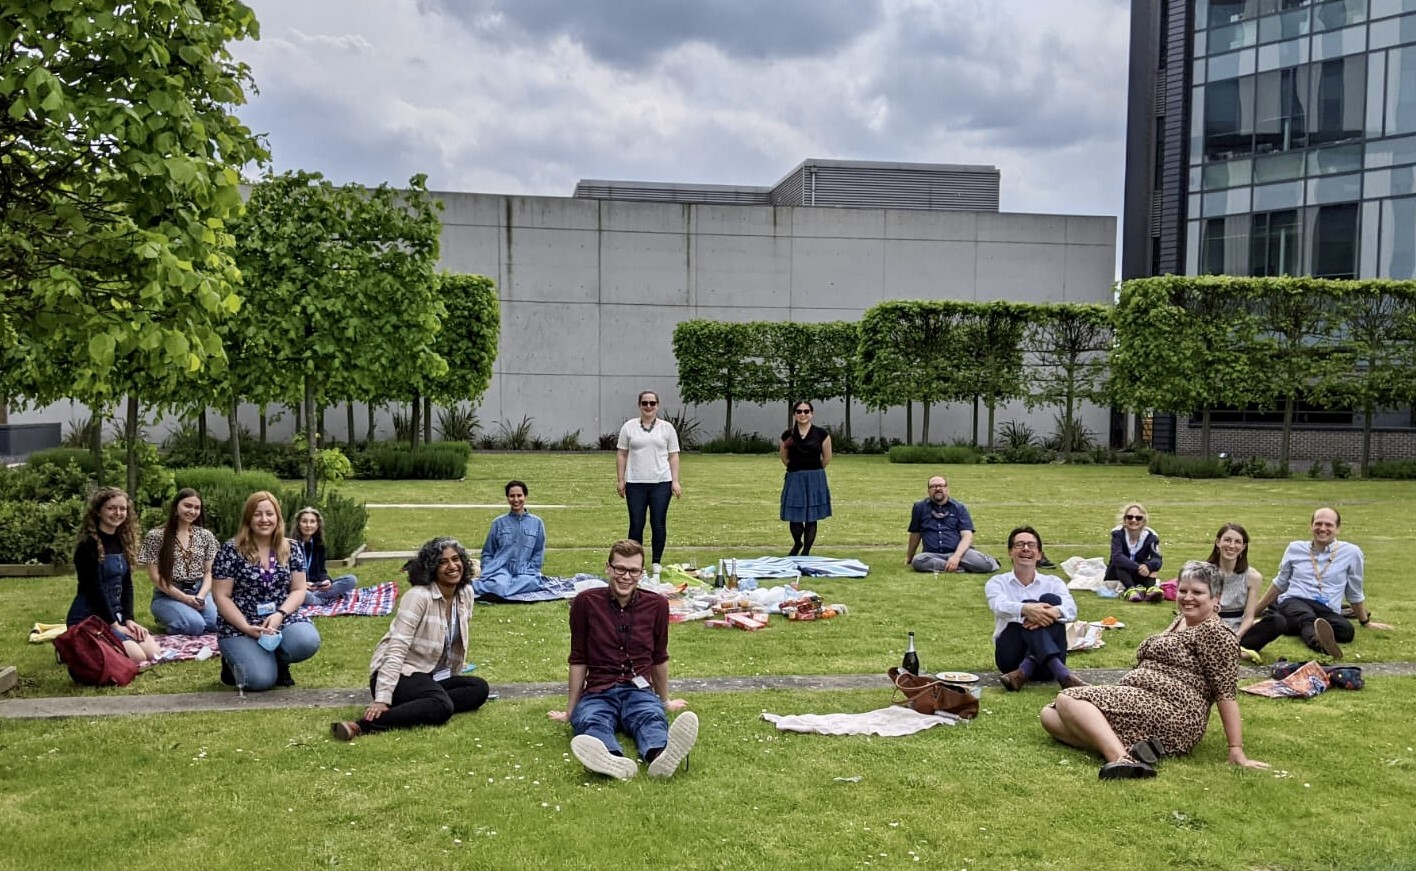 Samantha Mason with colleagues at a socially-distanced picnic, Cambridge